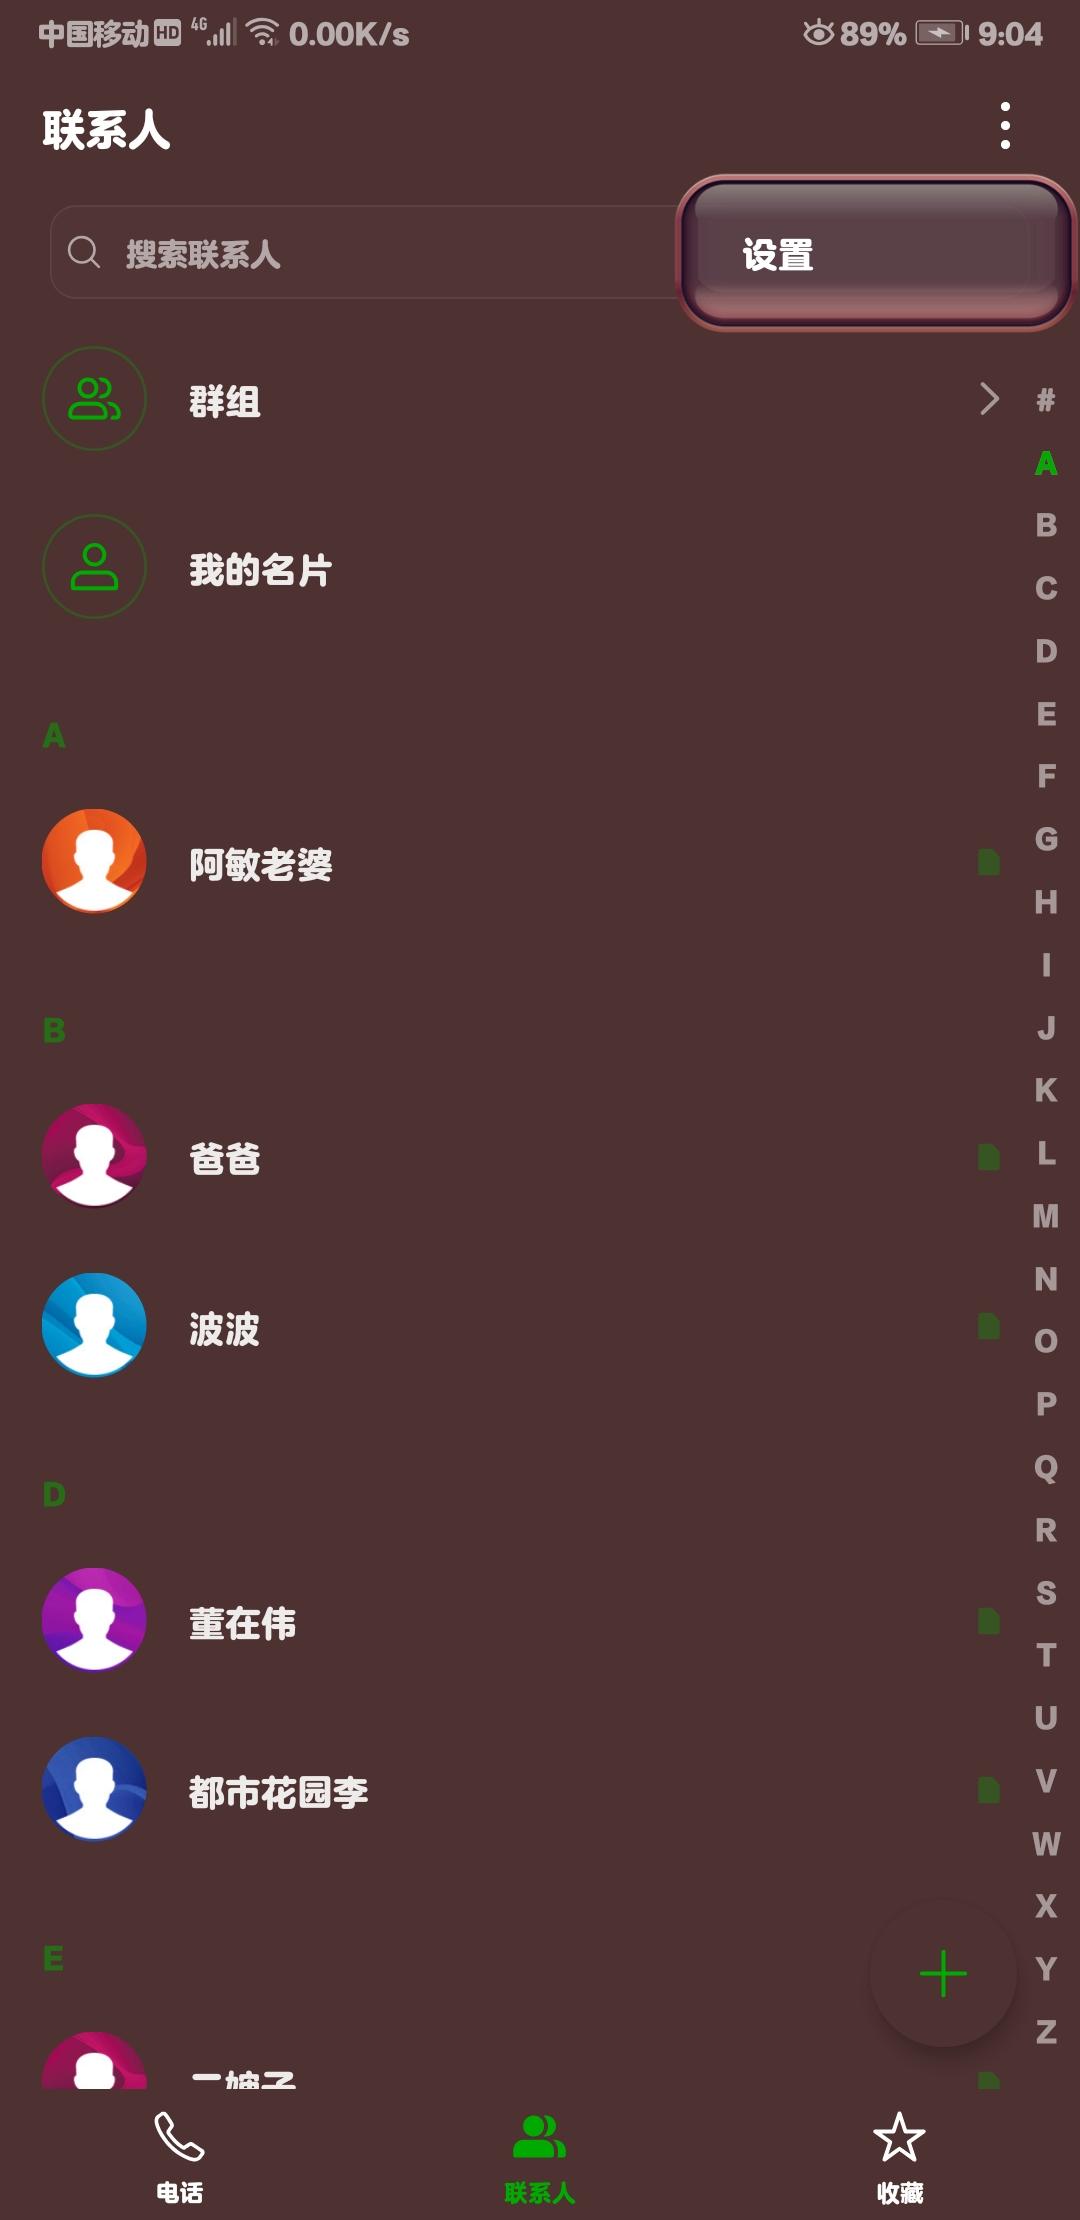 Screenshot_20190817_210409_com.android.contacts.jpg